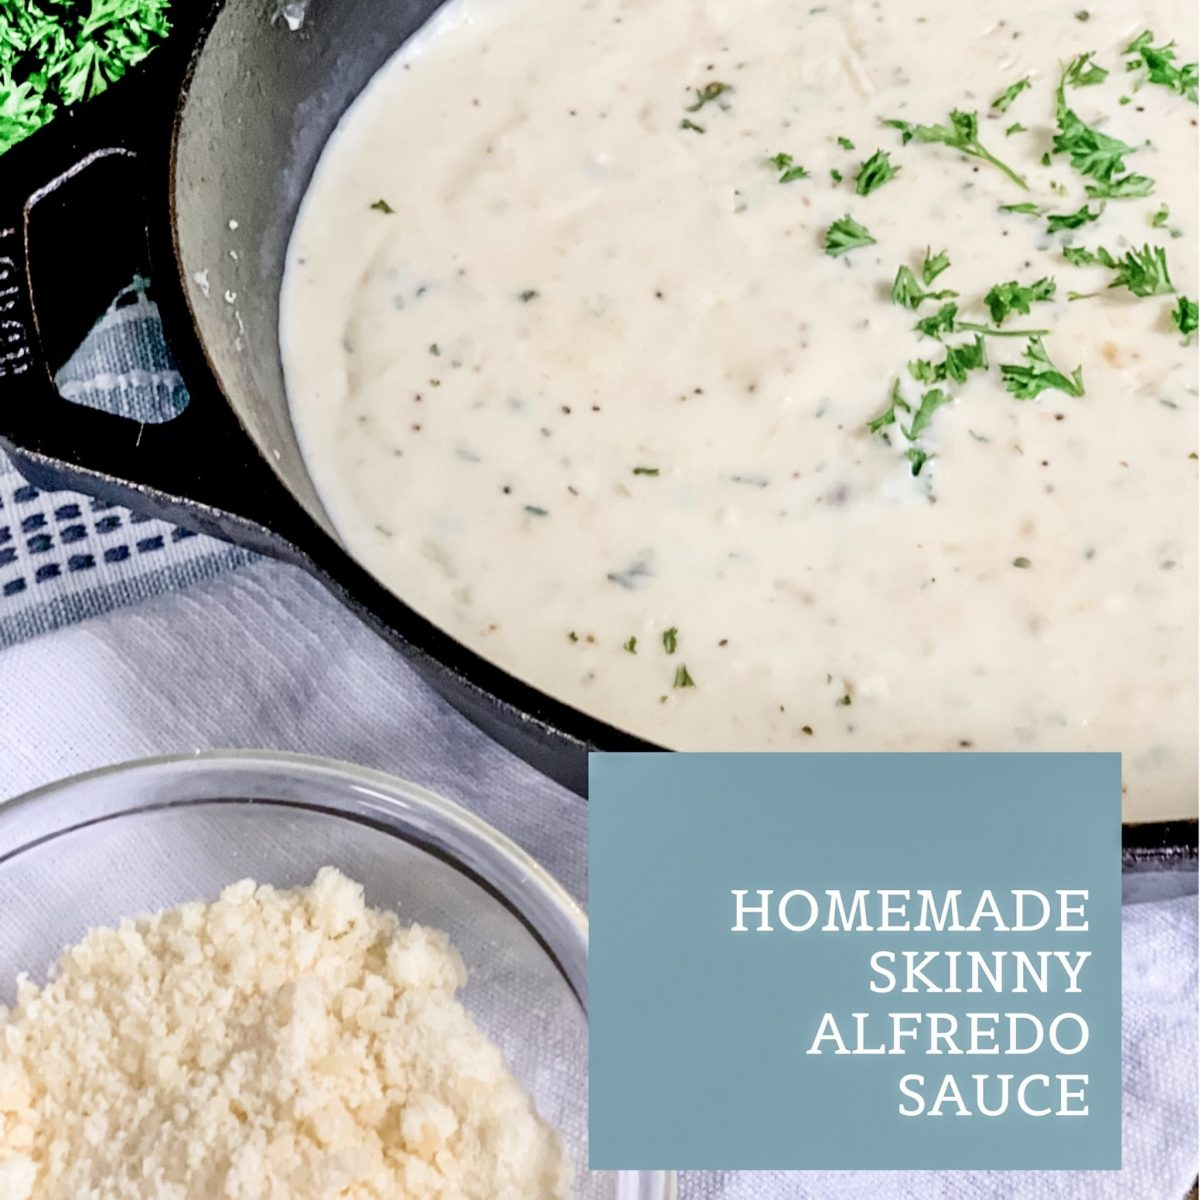 Homemade Skinny Alfredo Sauce